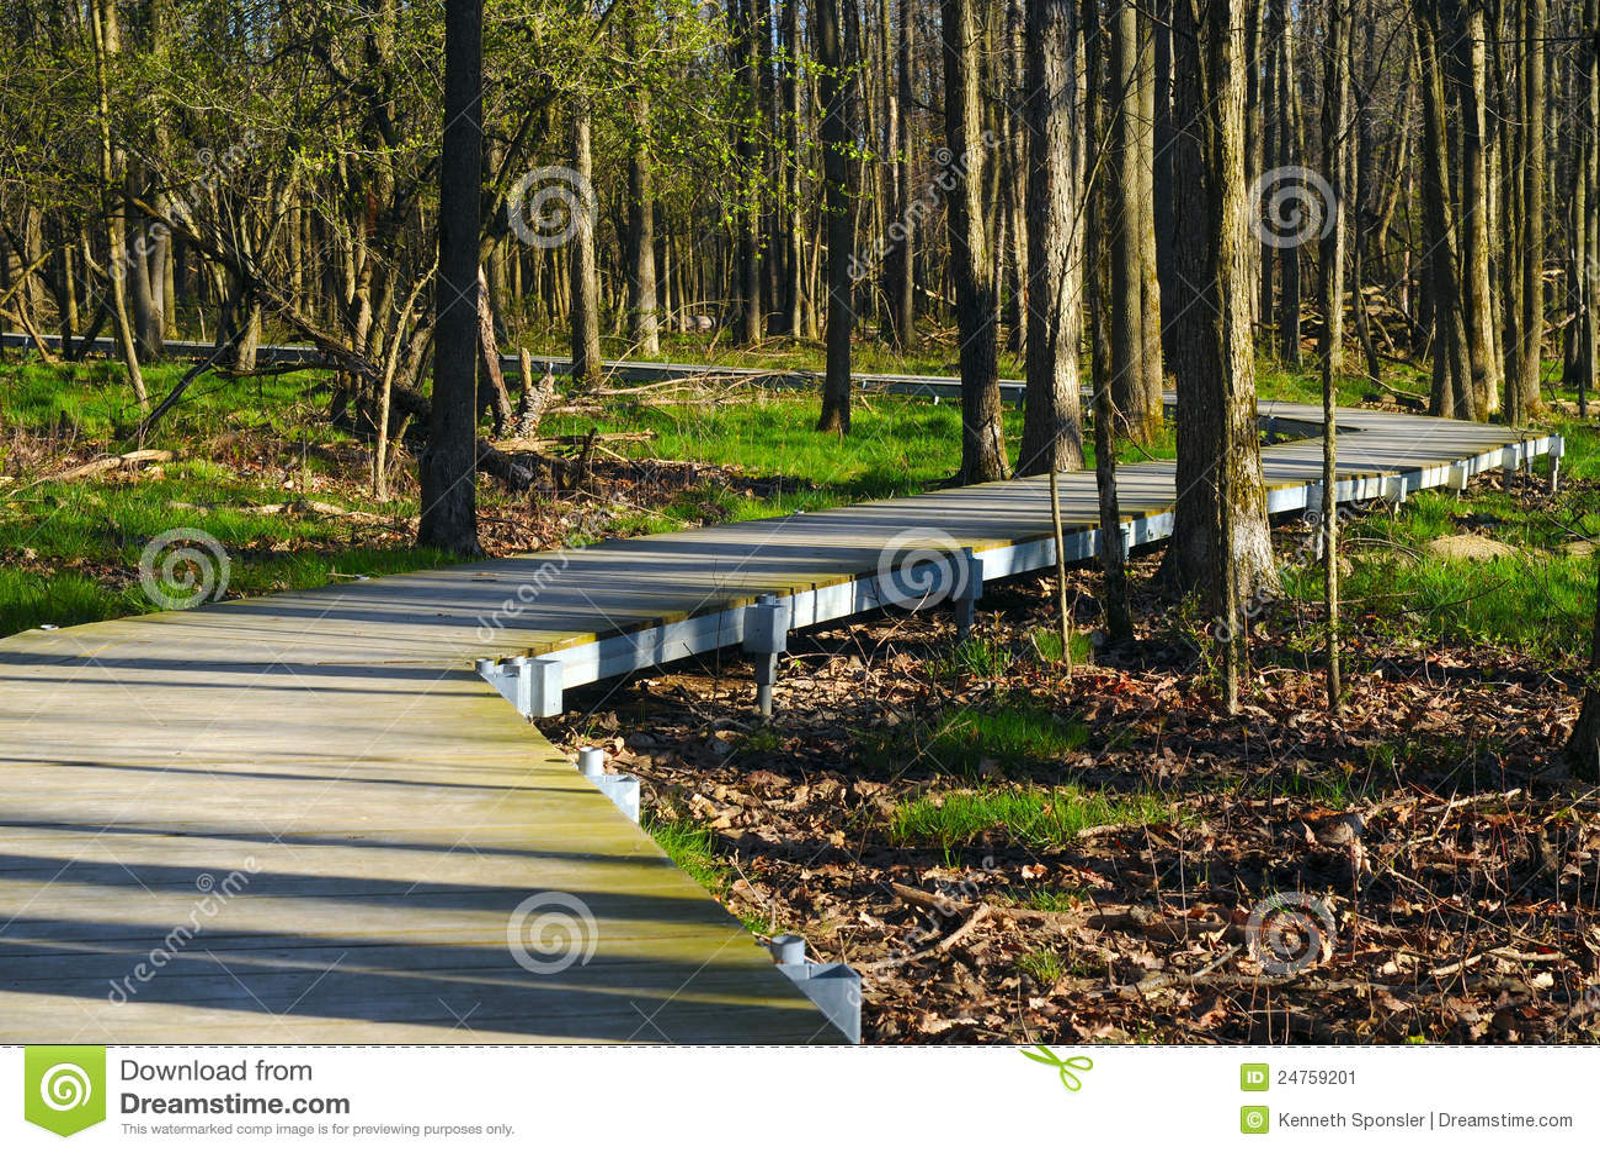 Woodlands boardwalk